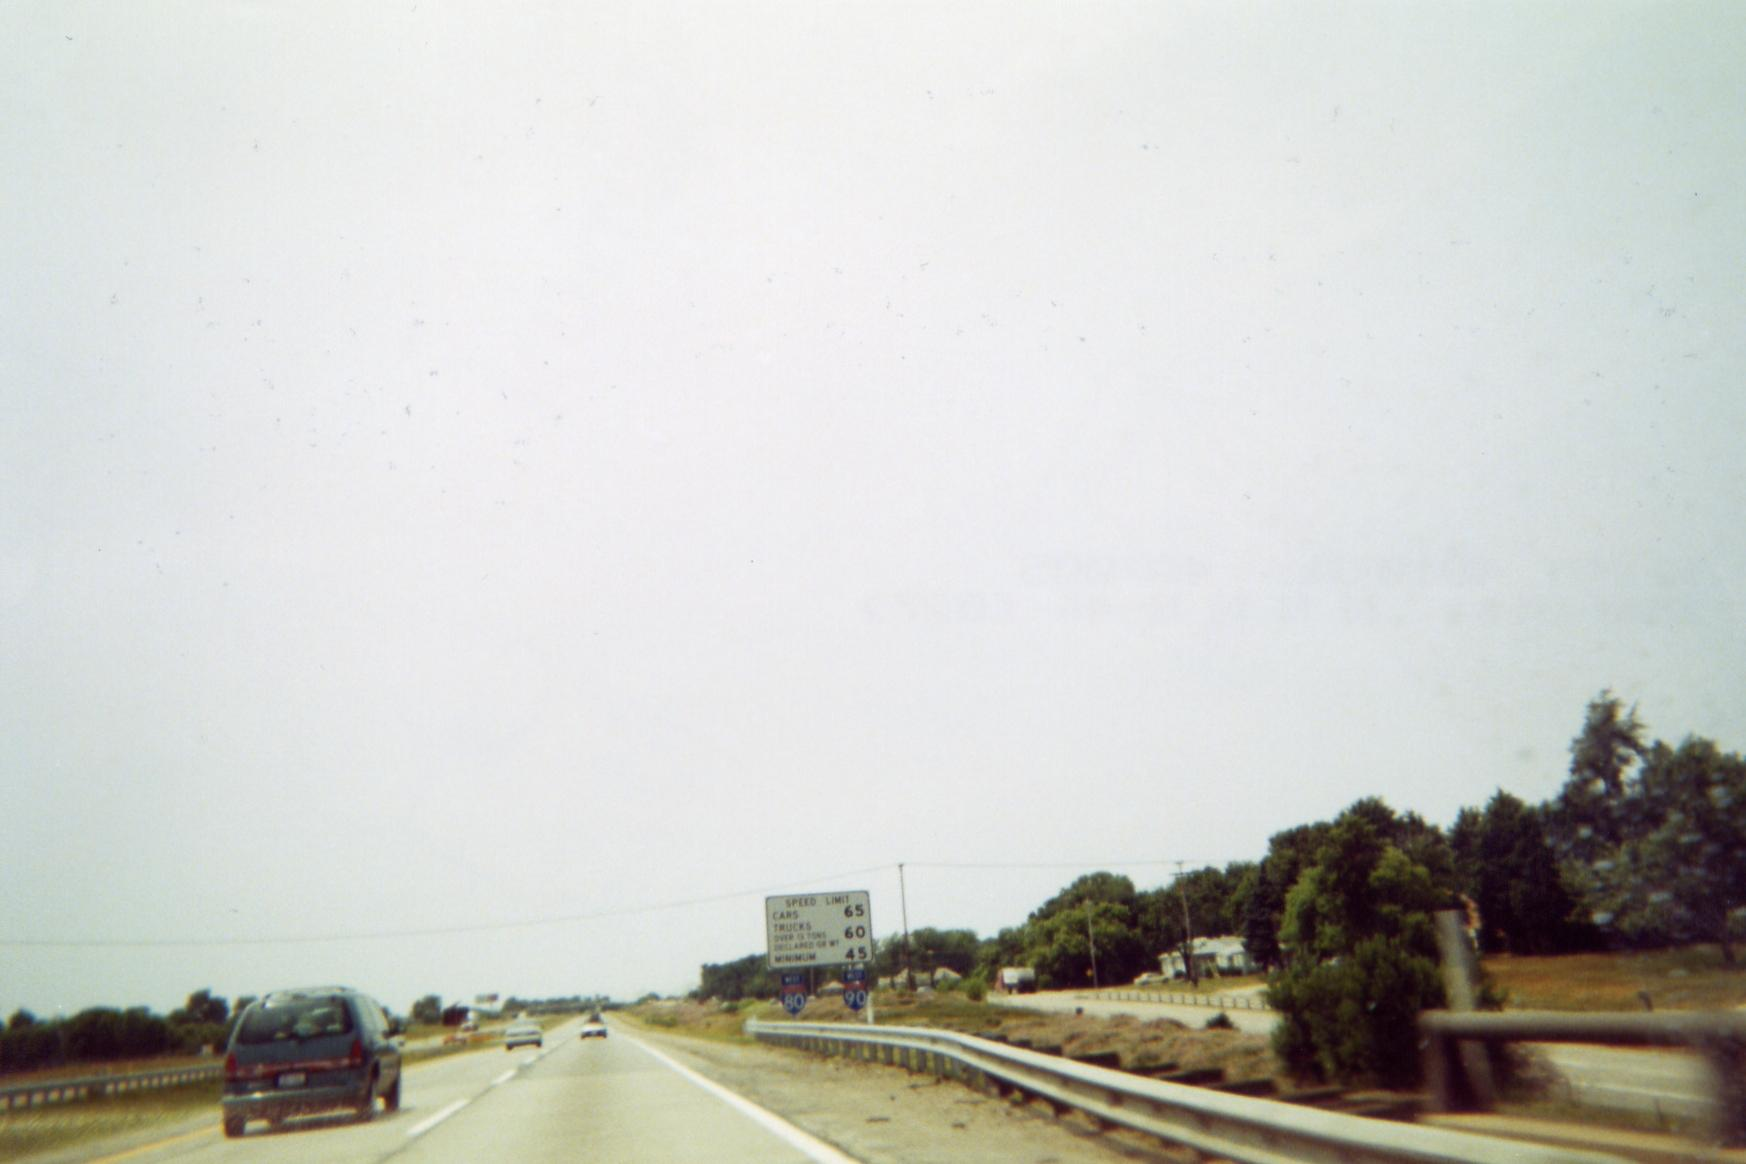 Indiana Toll Road Photos